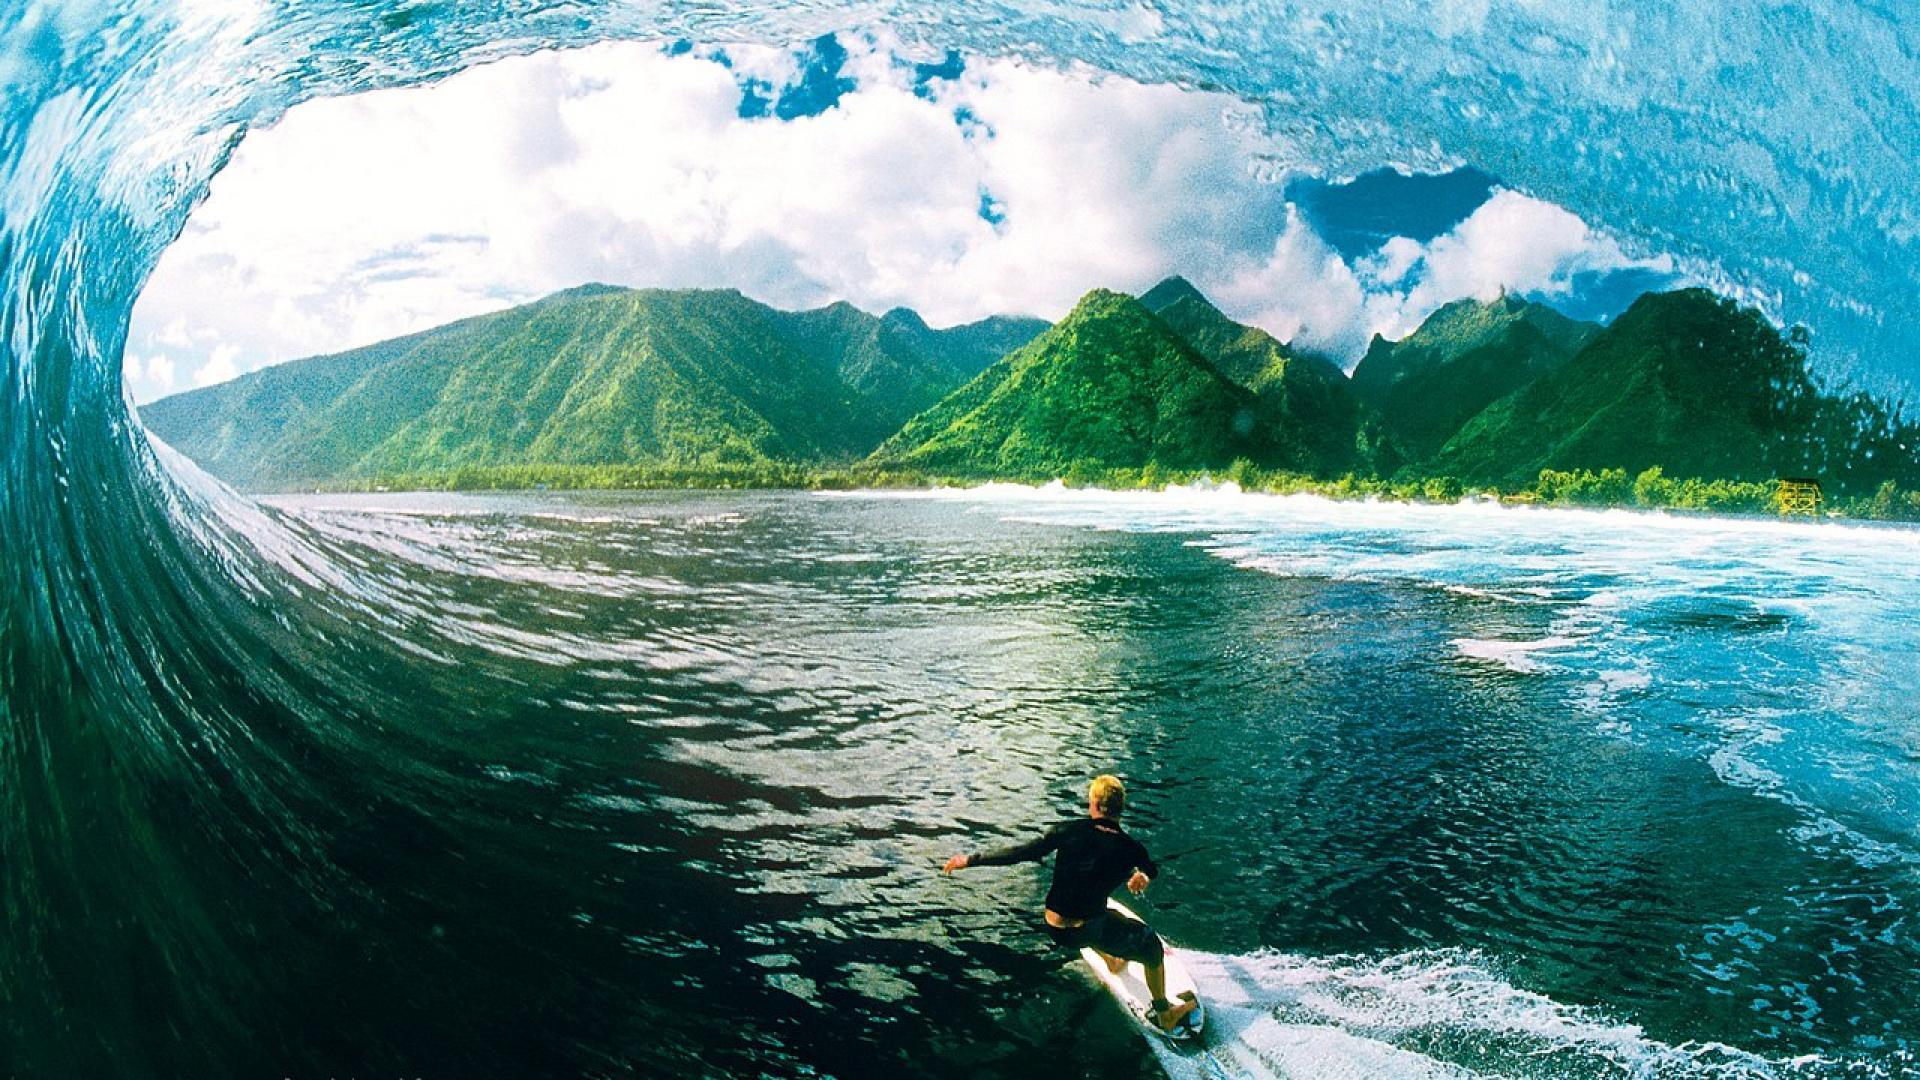 3d Fantasy Nature Wallpaper Surfing Wallpaper 1920x1080 44135